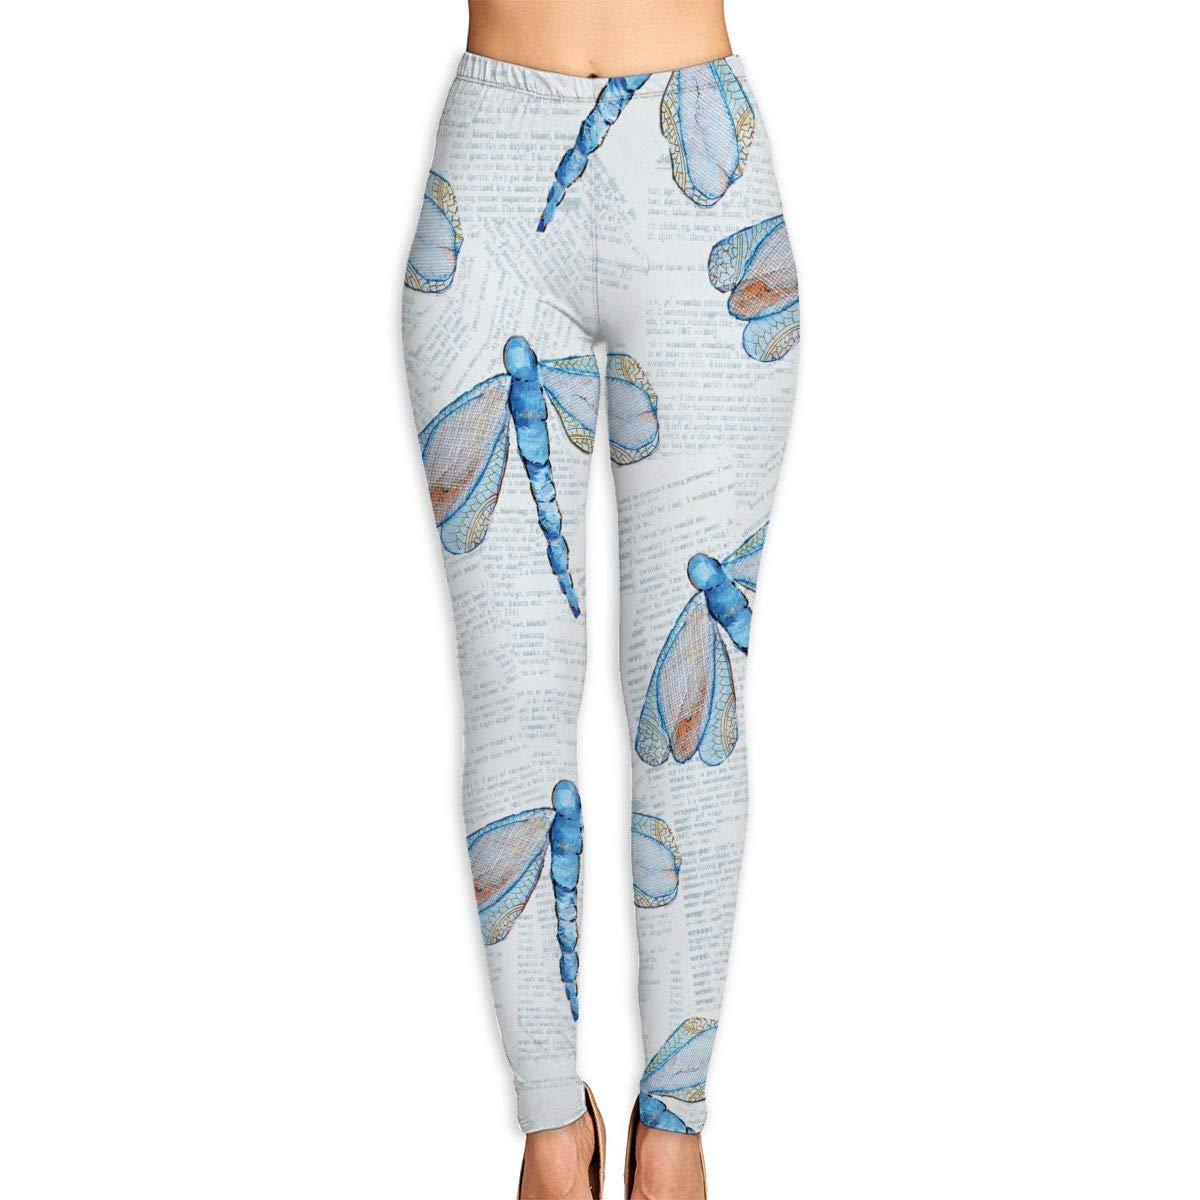 CVDGSAD Womens Power Yoga Pants Dragonfly Pattern Full ...